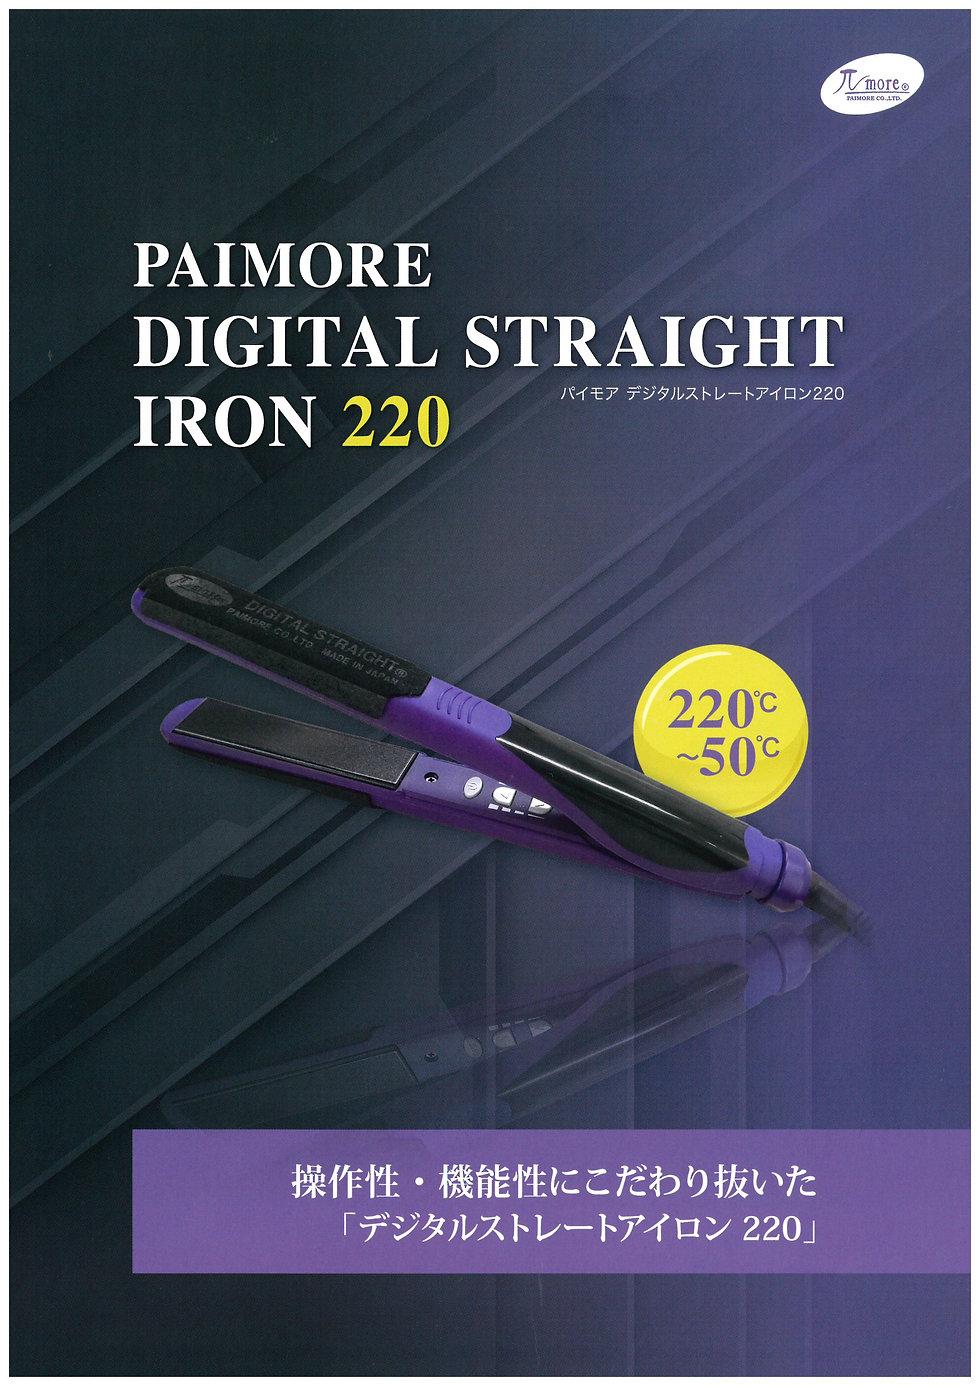 paimore_iron1.jpg